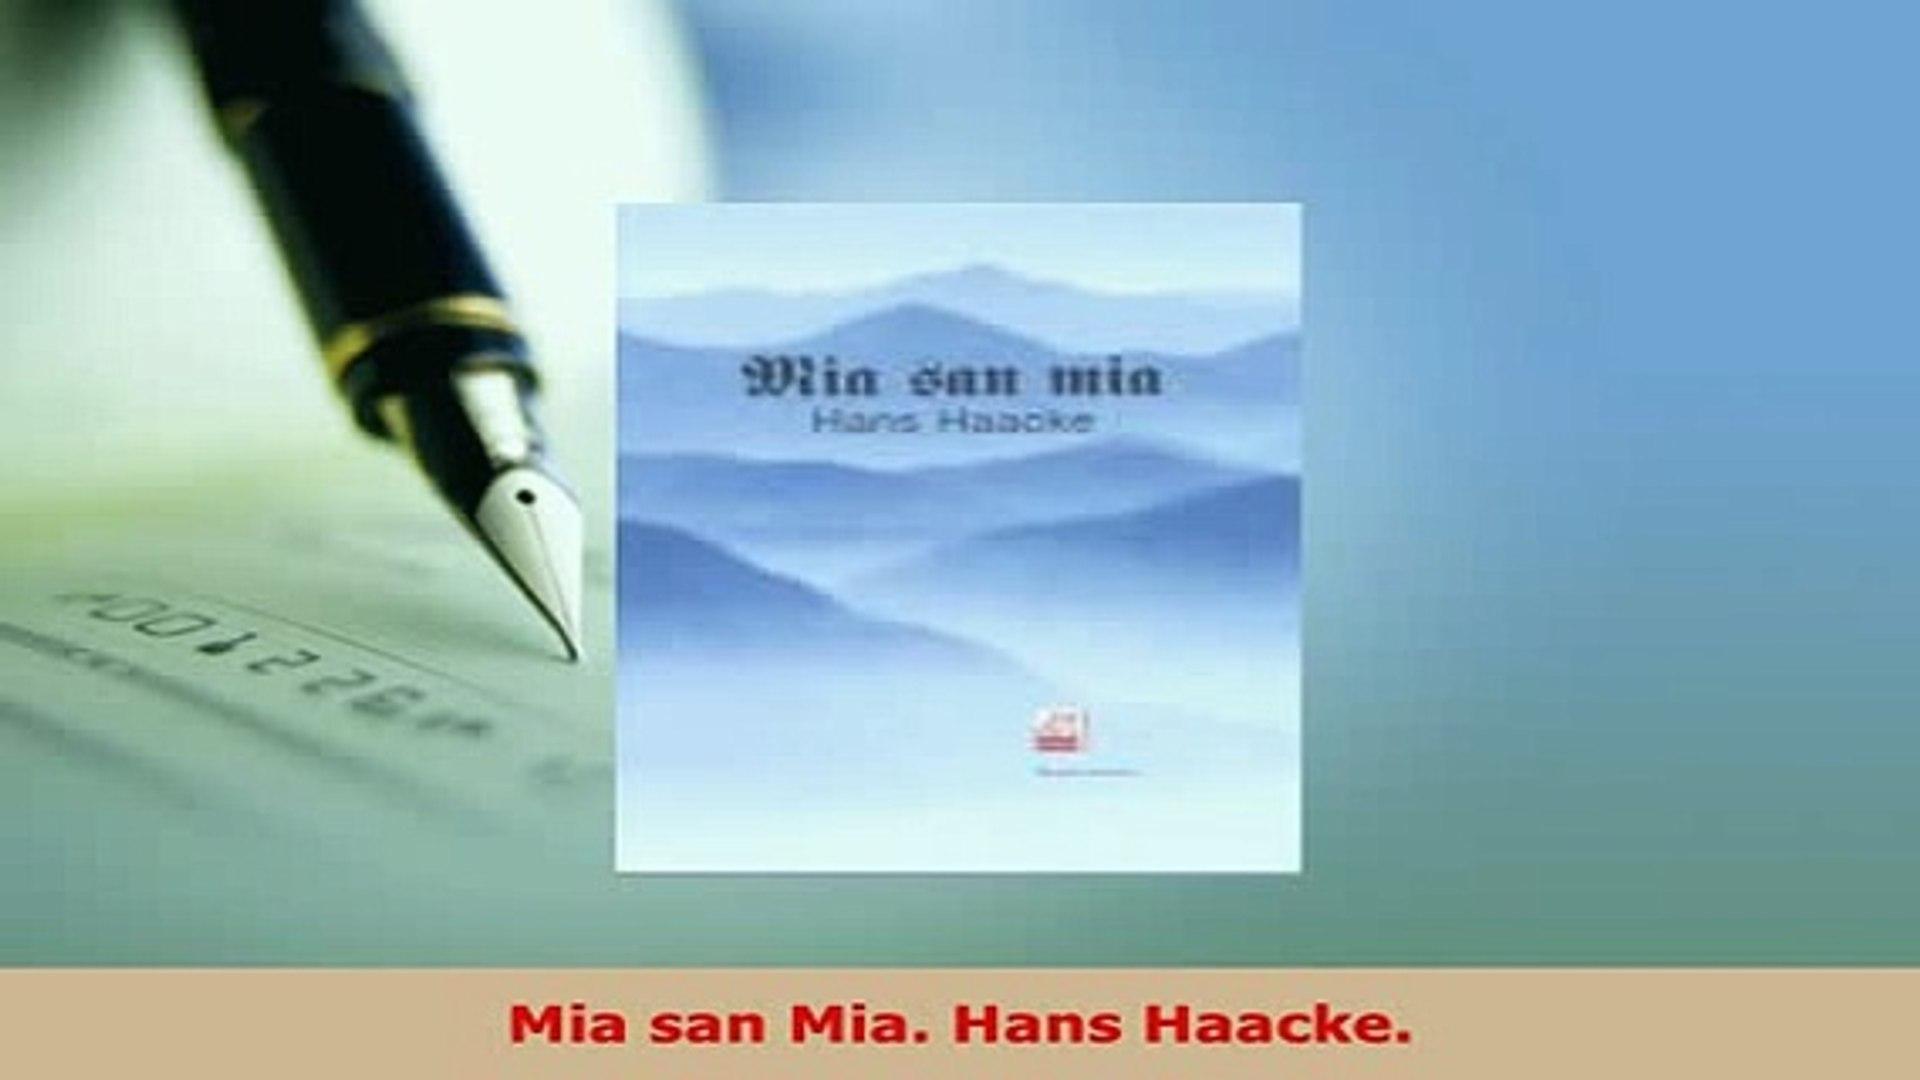 Download  Mia san Mia Hans Haacke Free Books